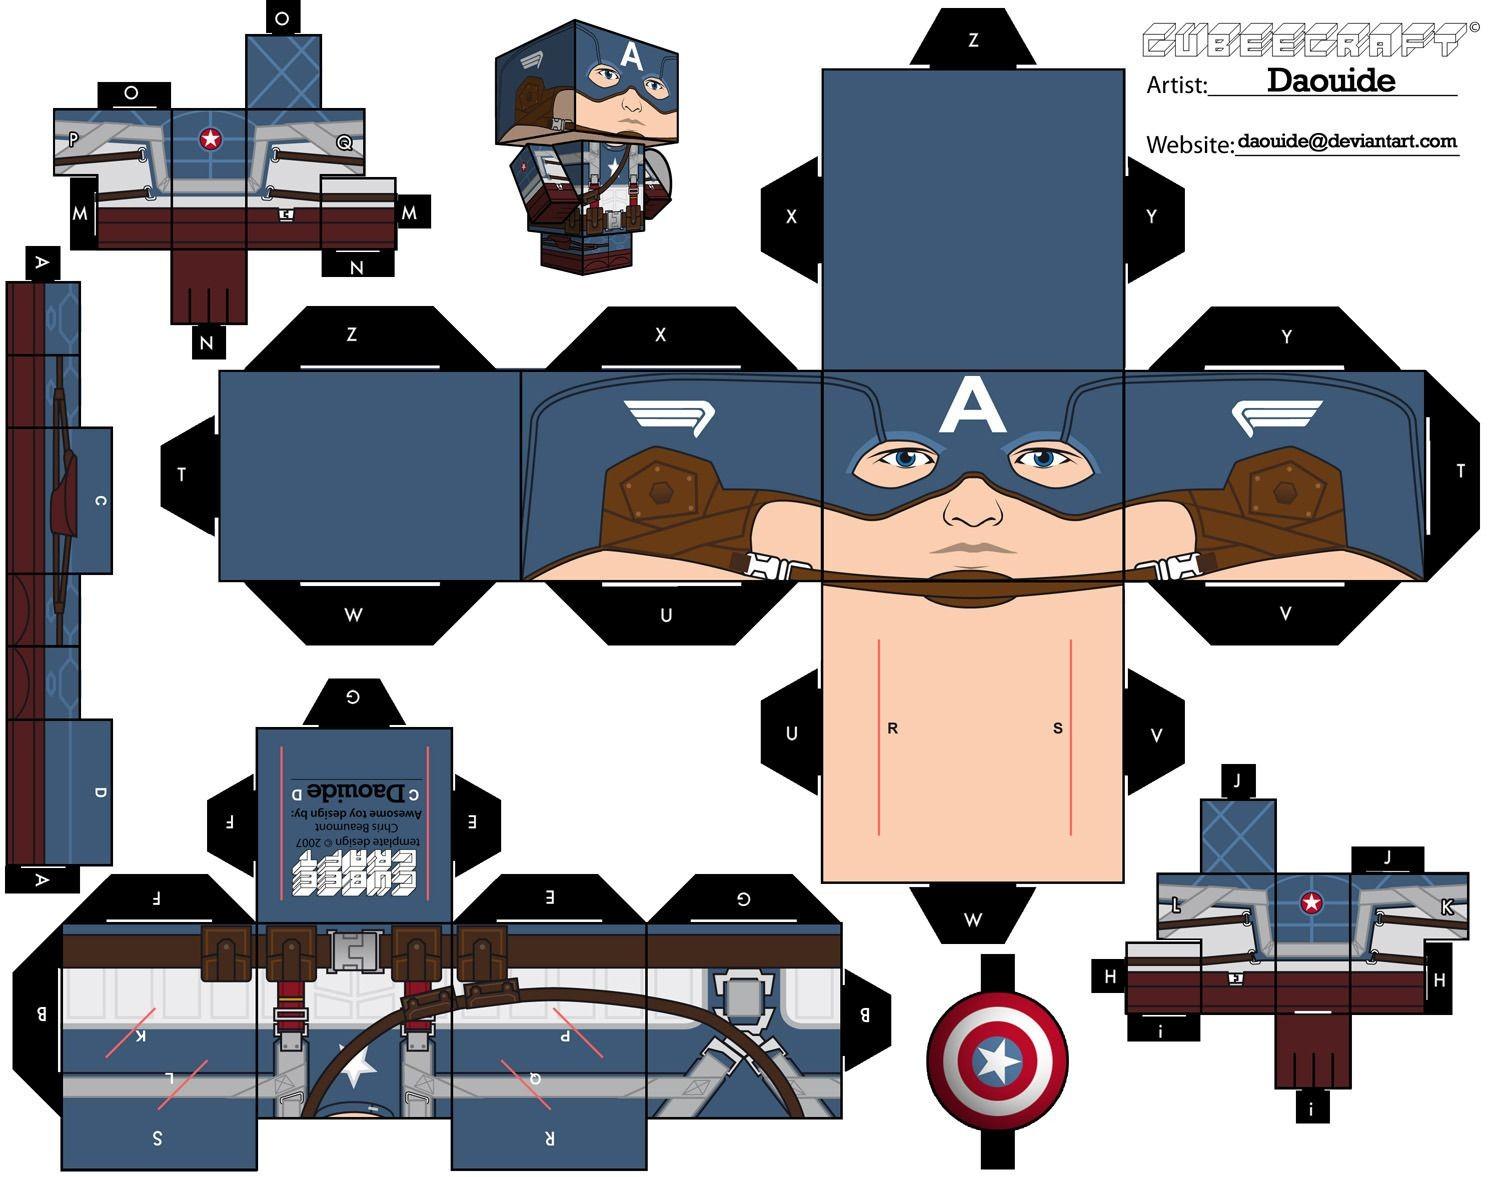 South Park Papercraft Megapost] Papercraft Tus Personajes Preferidos En Papel